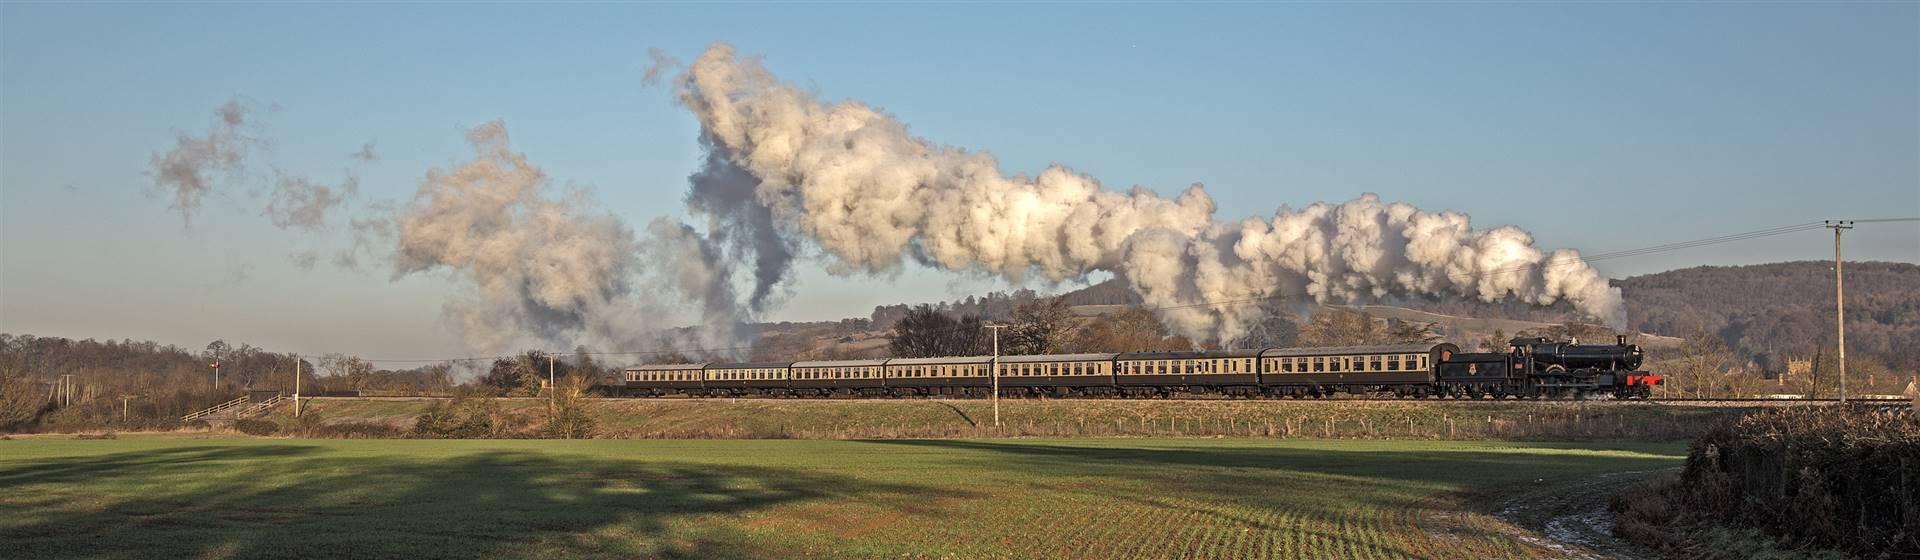 "<img src=""7820dinmoremanormalcolmranieri.jpeg"" alt=""Gloucester & Warwickshire Railway""/>"